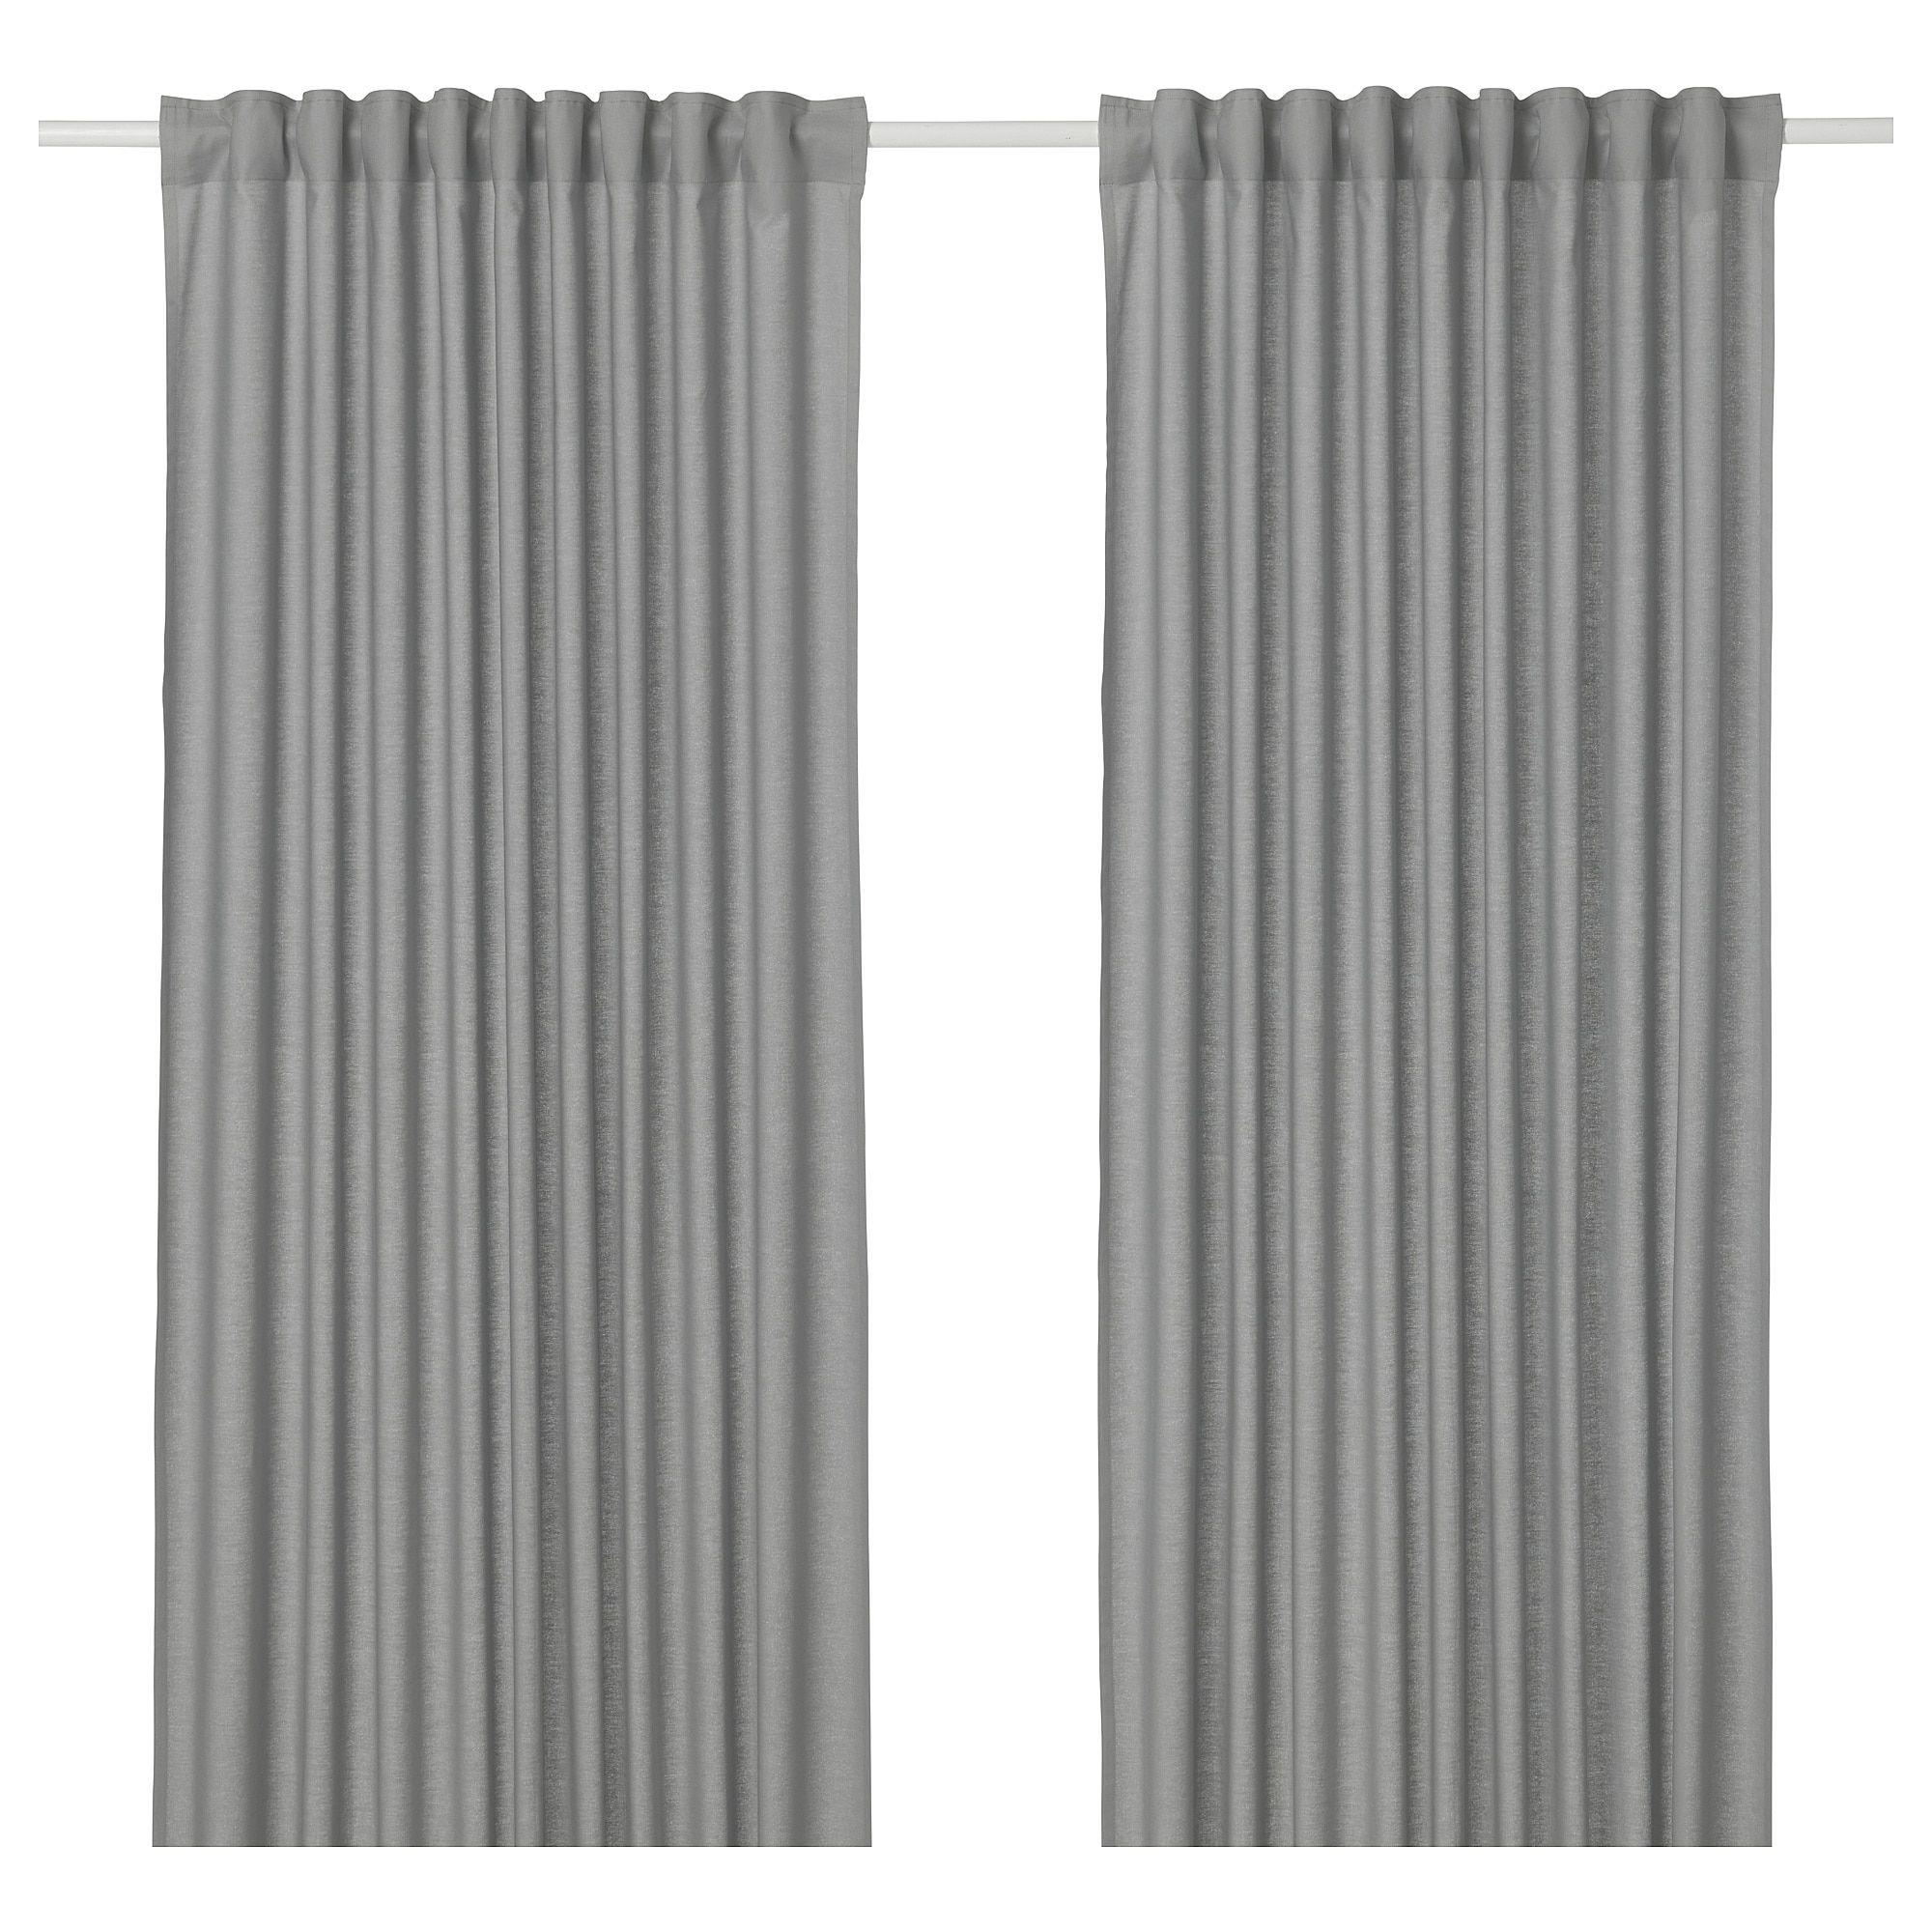 Ikea Annalouisa Gray Curtains 1 Pair Curtain Rods Curtains